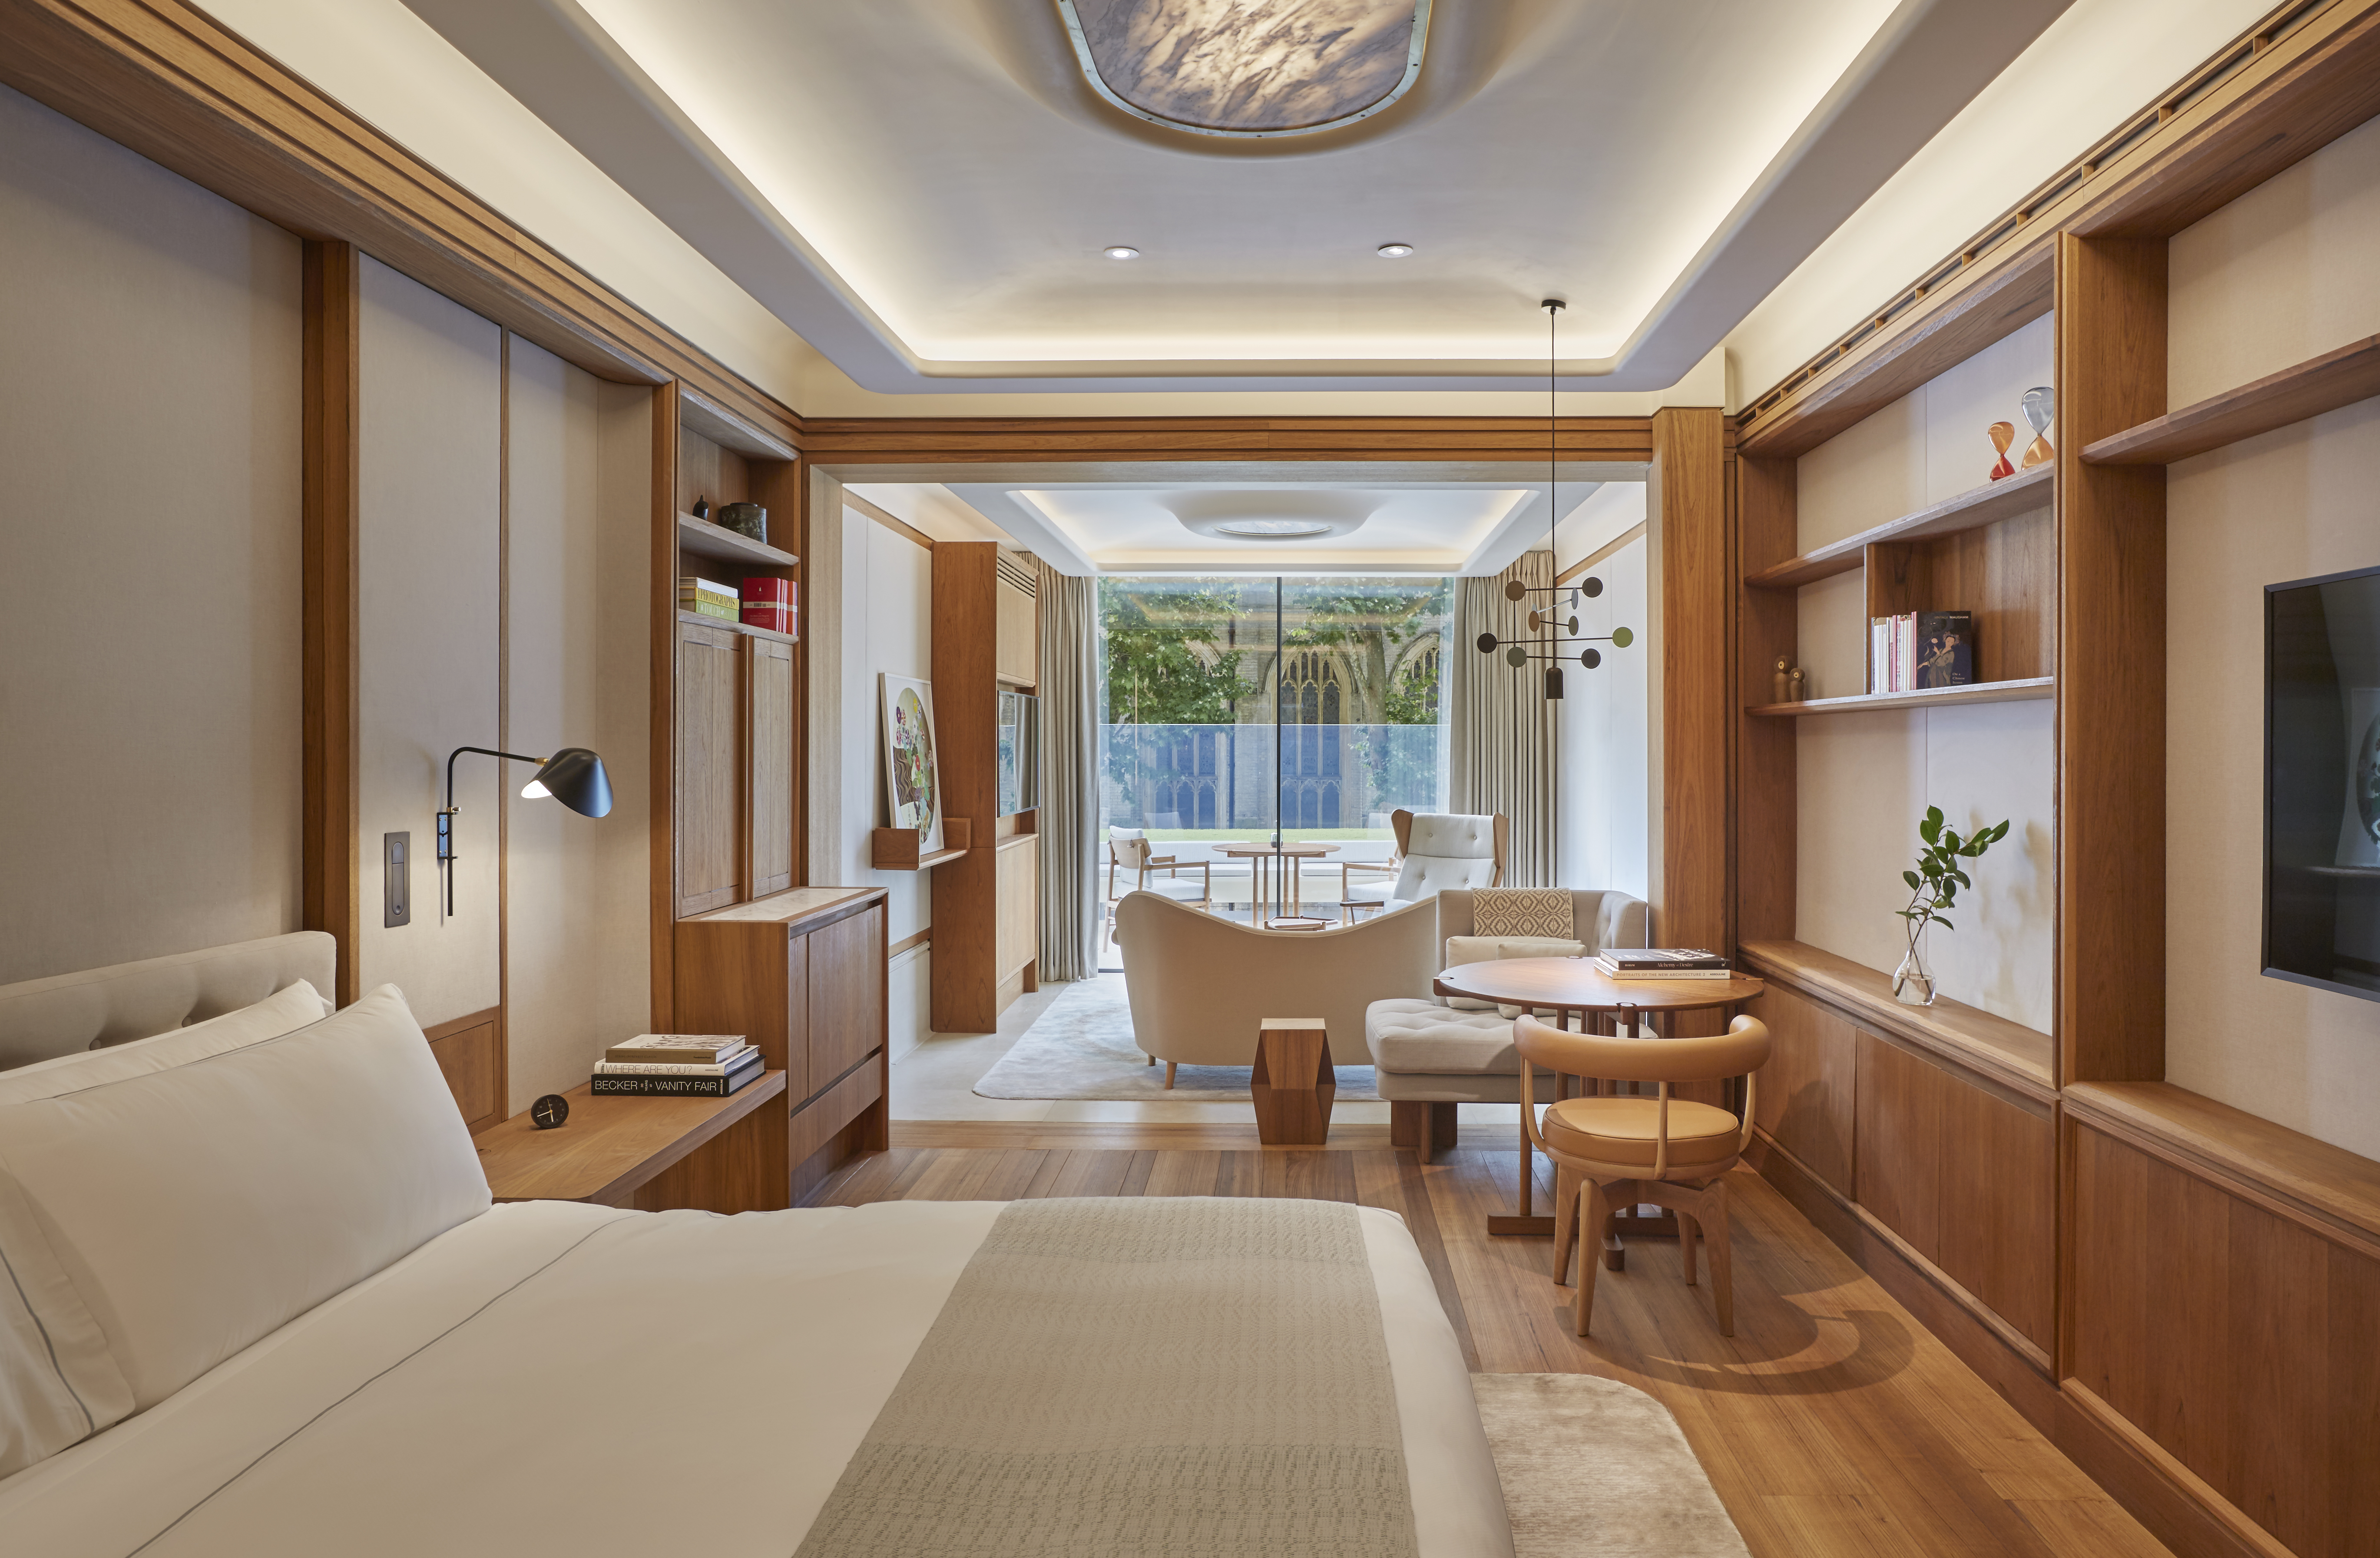 Architect John Heah Designs For The Berkeley Hotel London